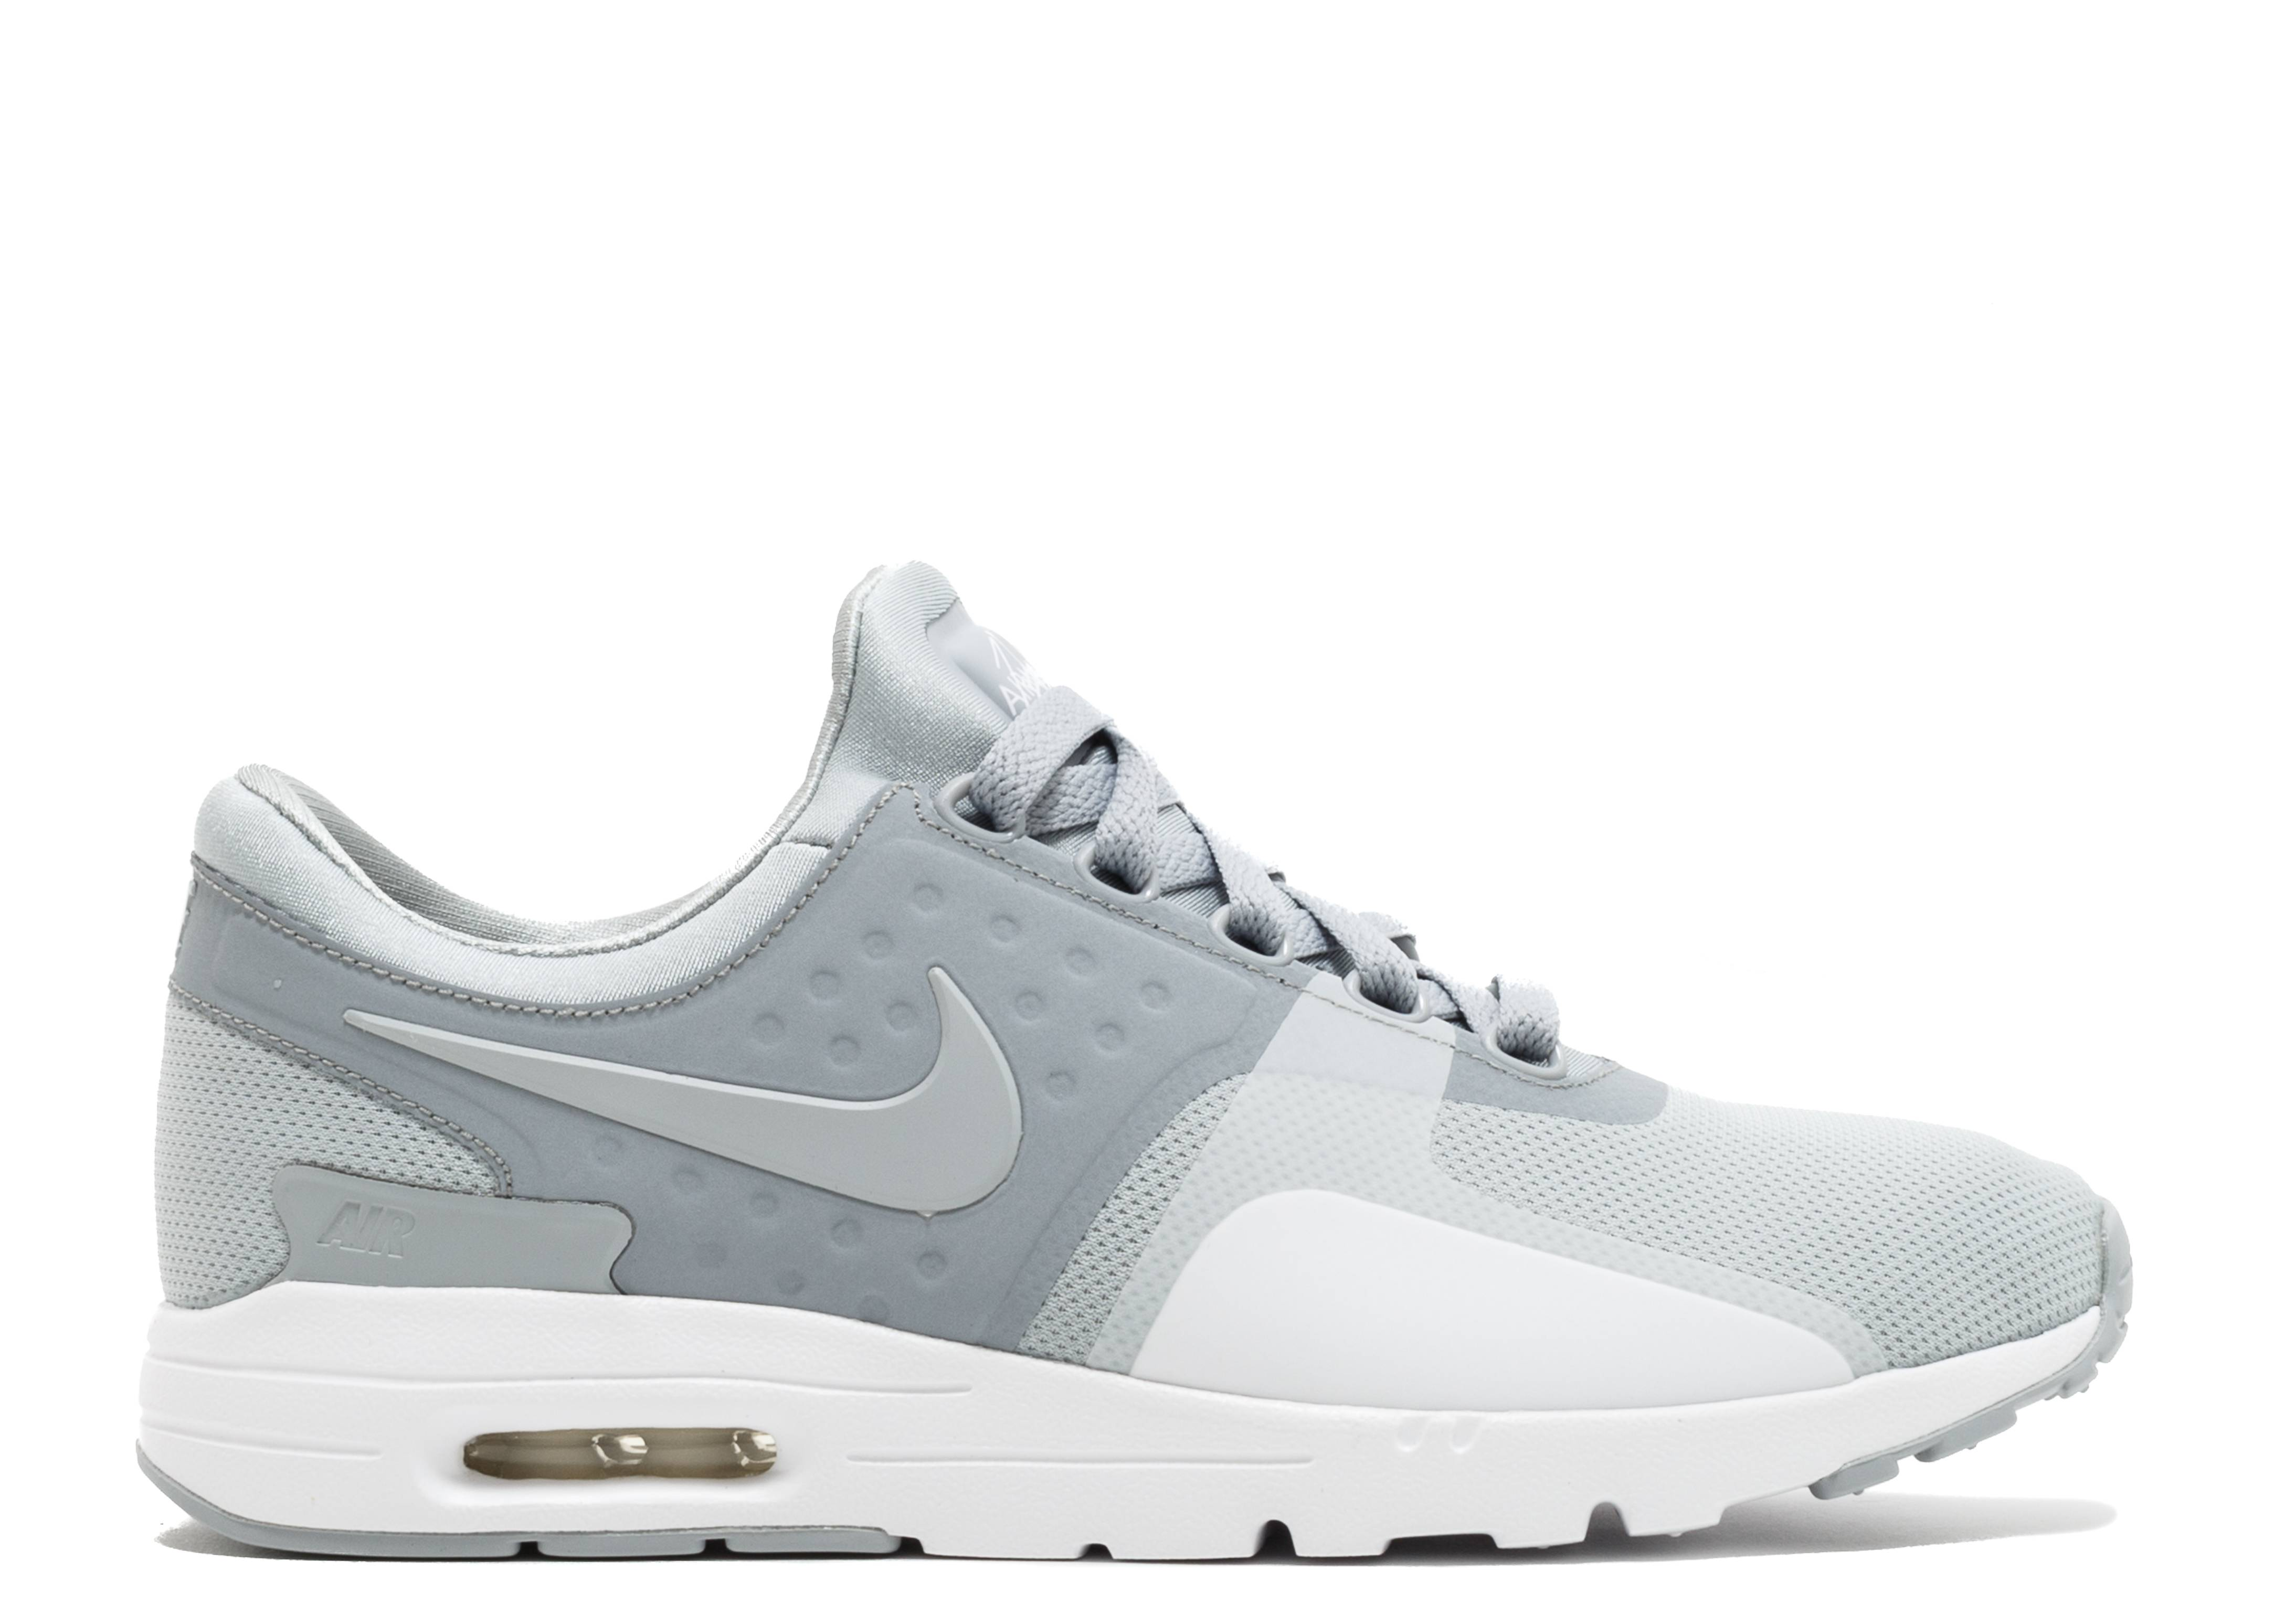 buy online 89d8e ca7c6 Wmns Air Max Zero - Nike - 857661 009 - wolf grey/wolf grey-white ...